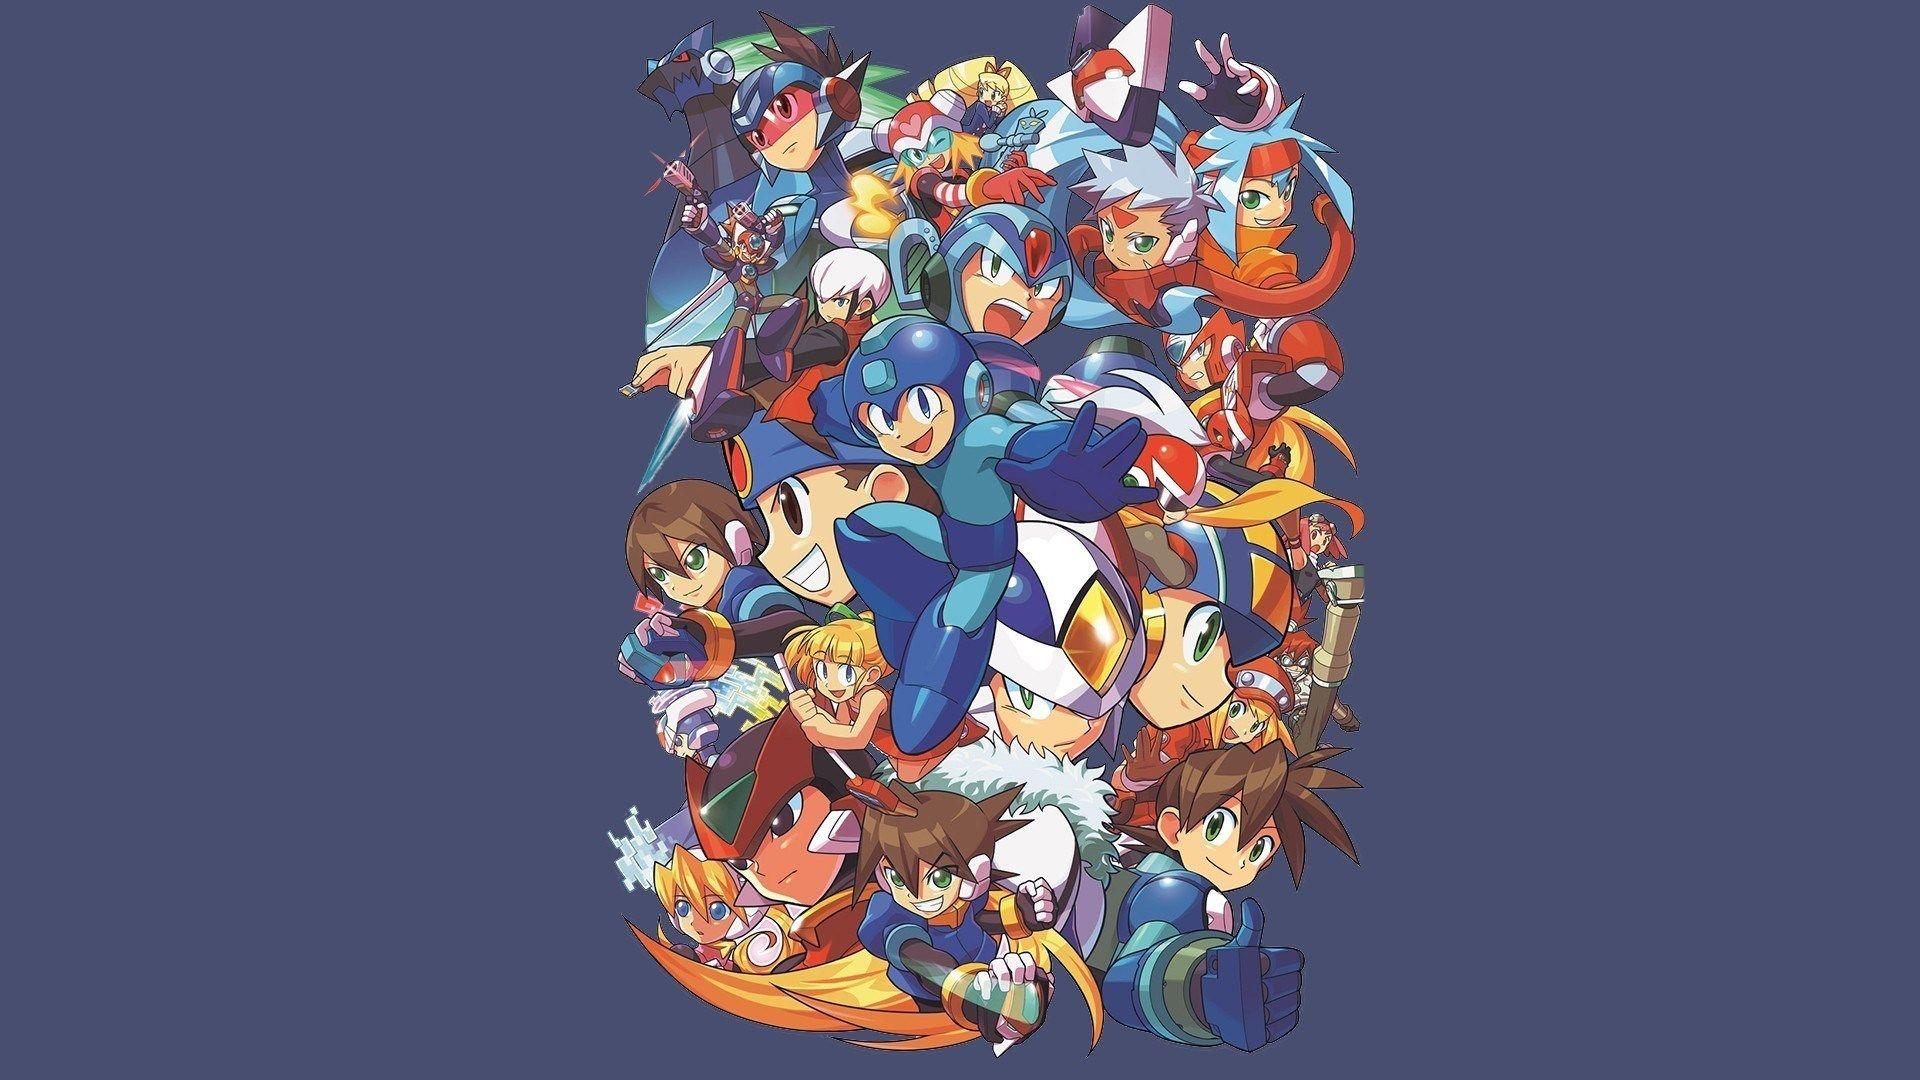 Mega Man 1920x1080 Wallpaper 4k Hd